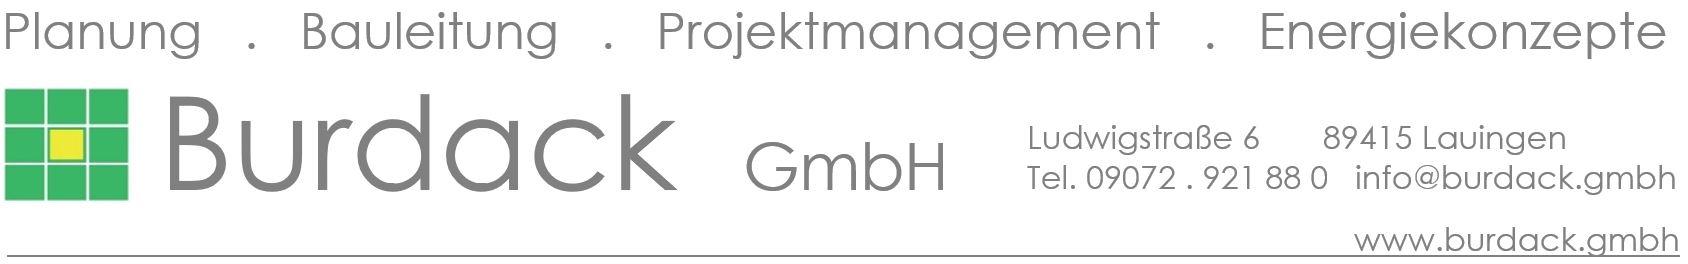 Burdack-GmbH-Logo